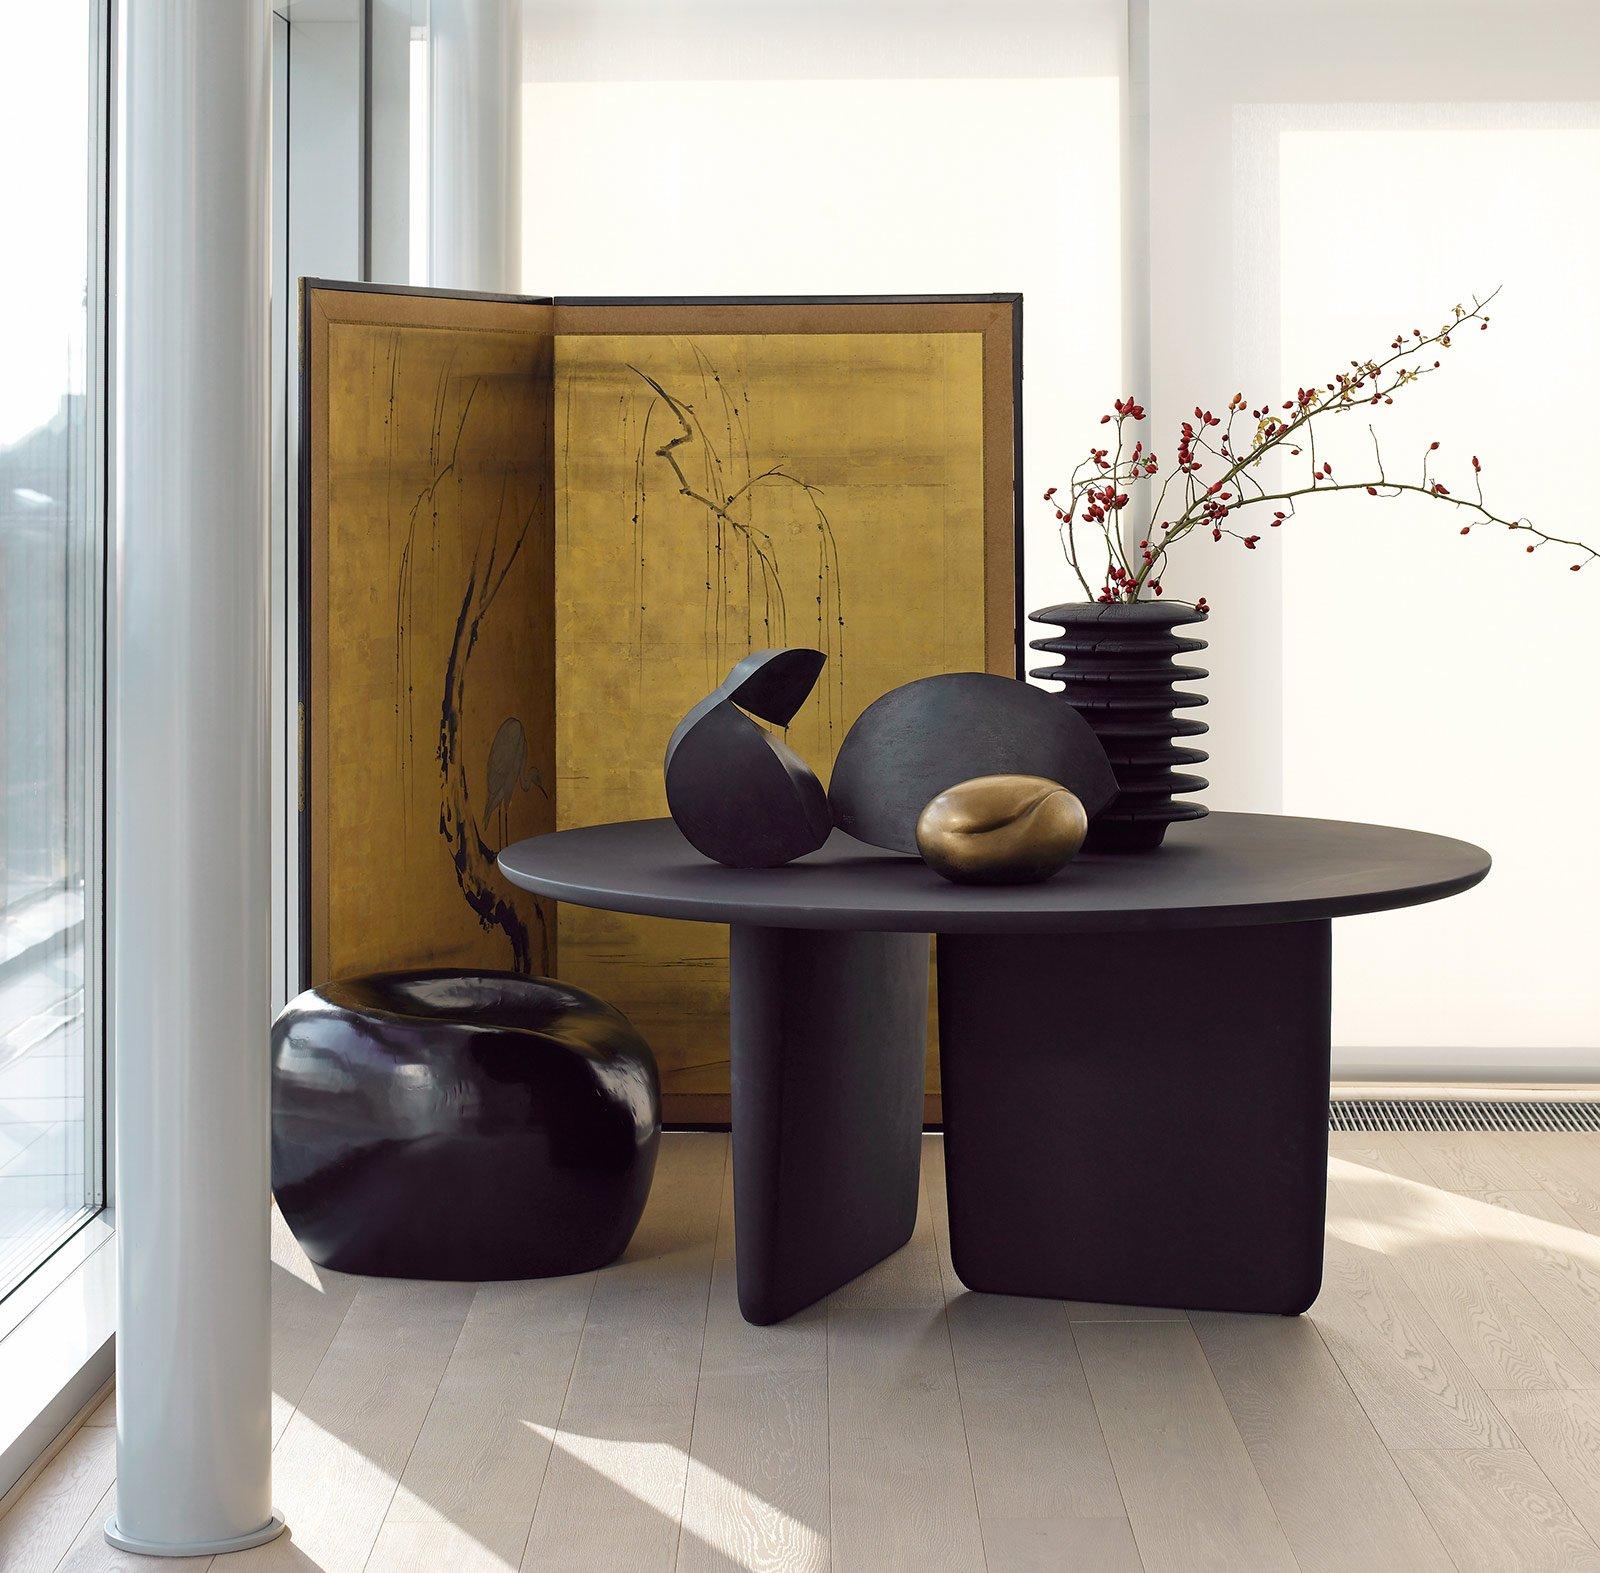 tavoli rotondi e ovali: design morbido, minimal, dinamico - cose ... - Tavolo Rotondo Moderno Design